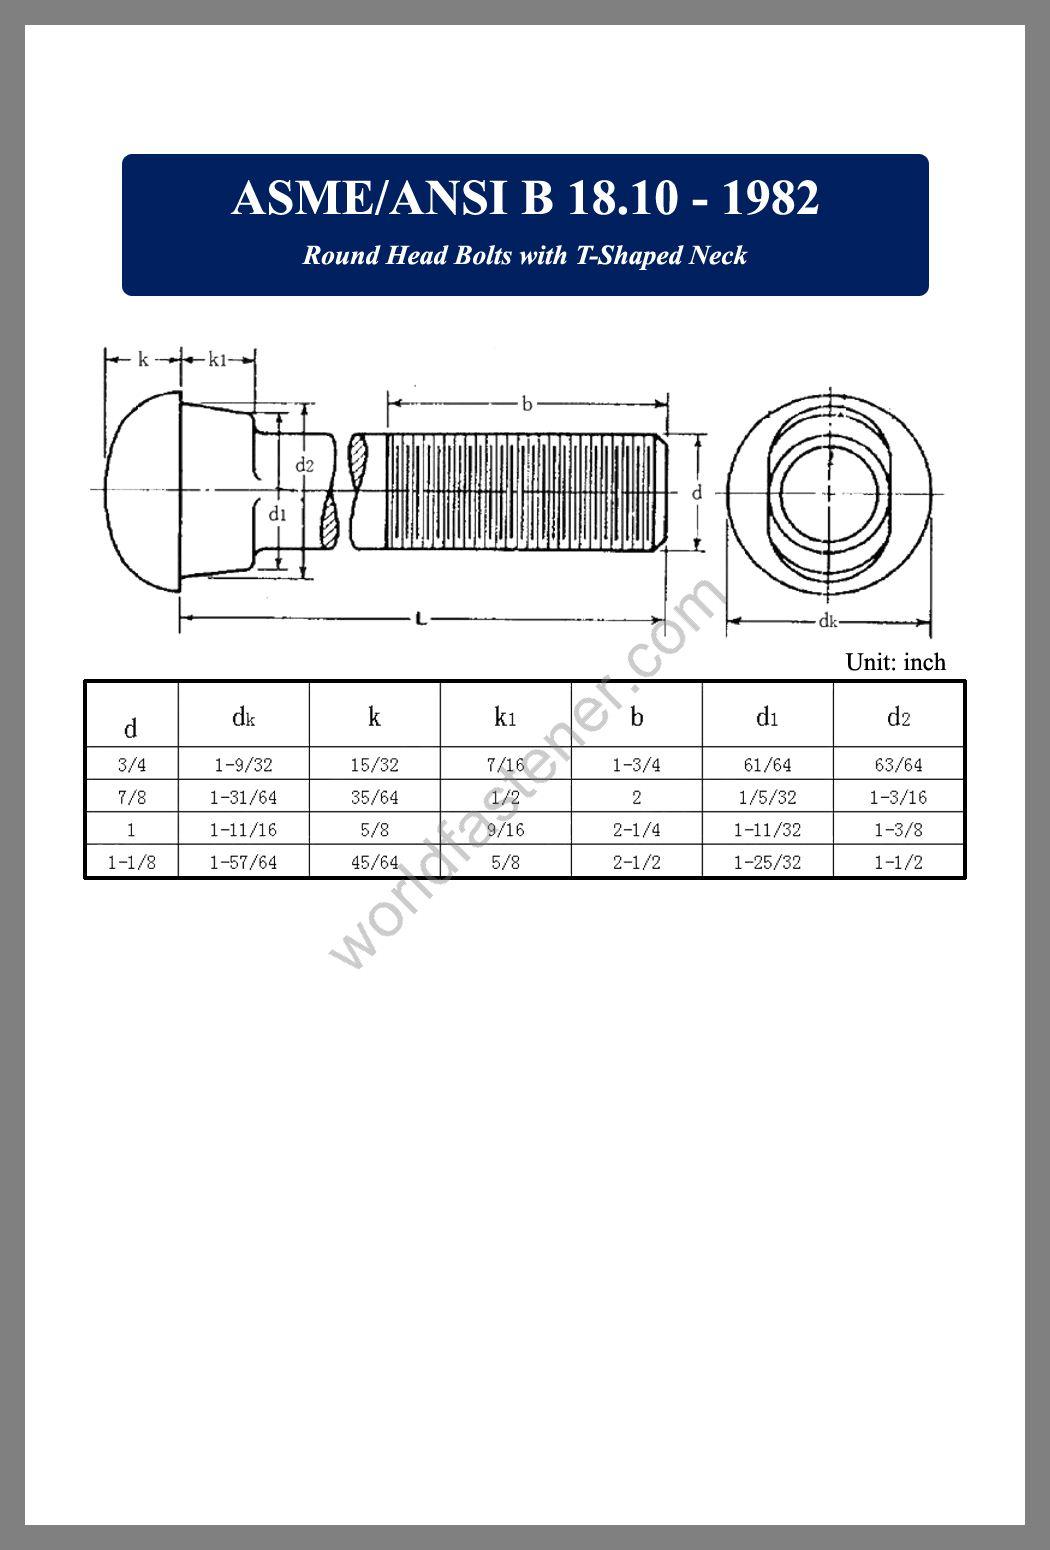 B18.10, ASME-ANSI B18.10 Round Head Bolts, fastener, screw, bolt